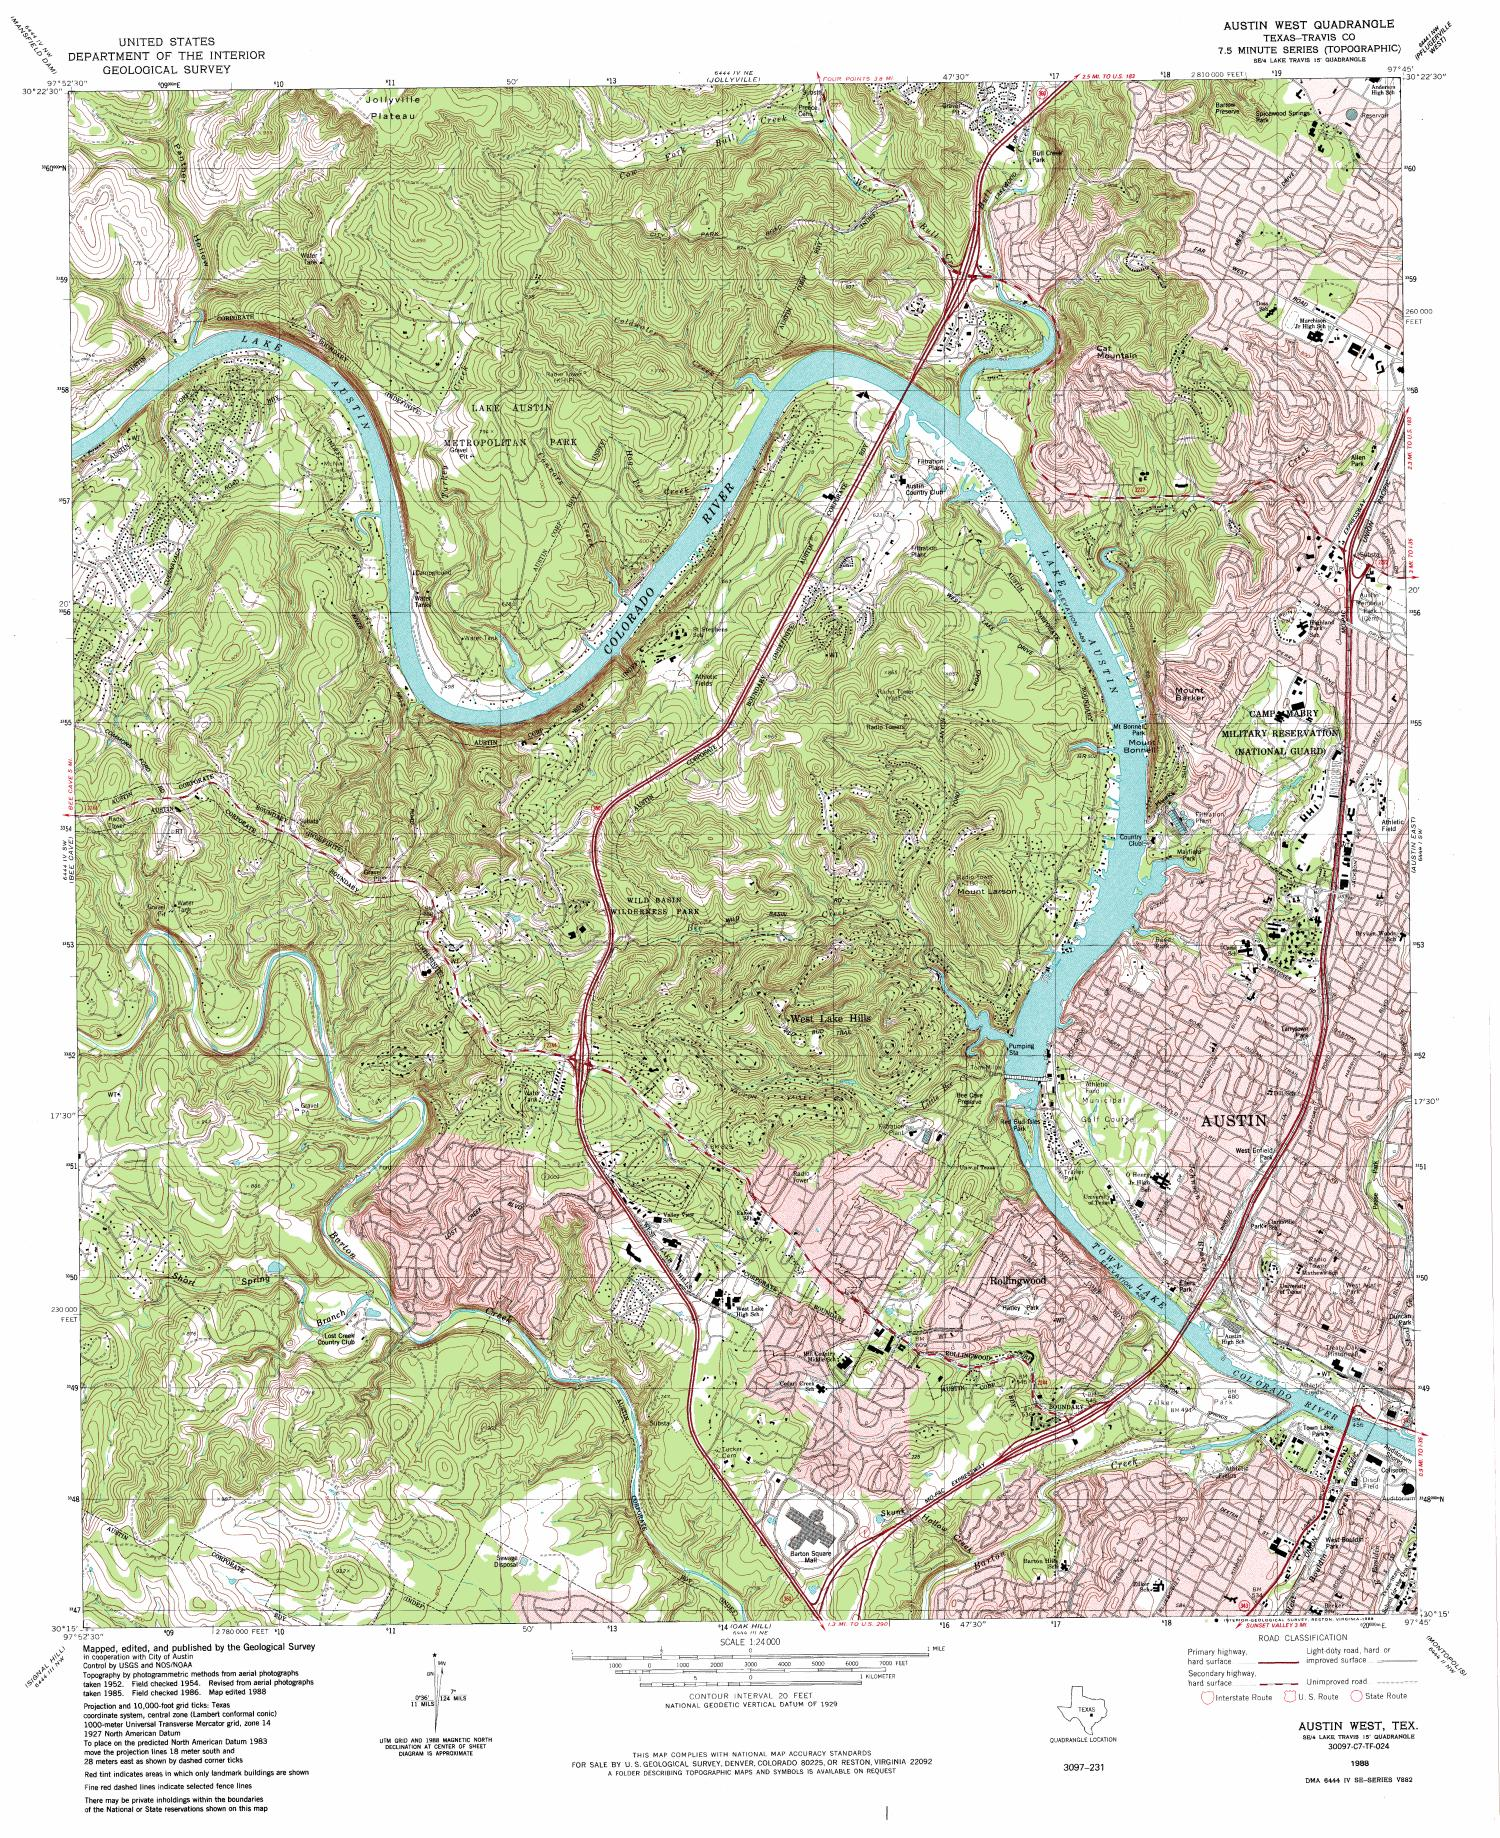 Austin West Quadrangle The Portal To Texas History - Usgs topo quad maps